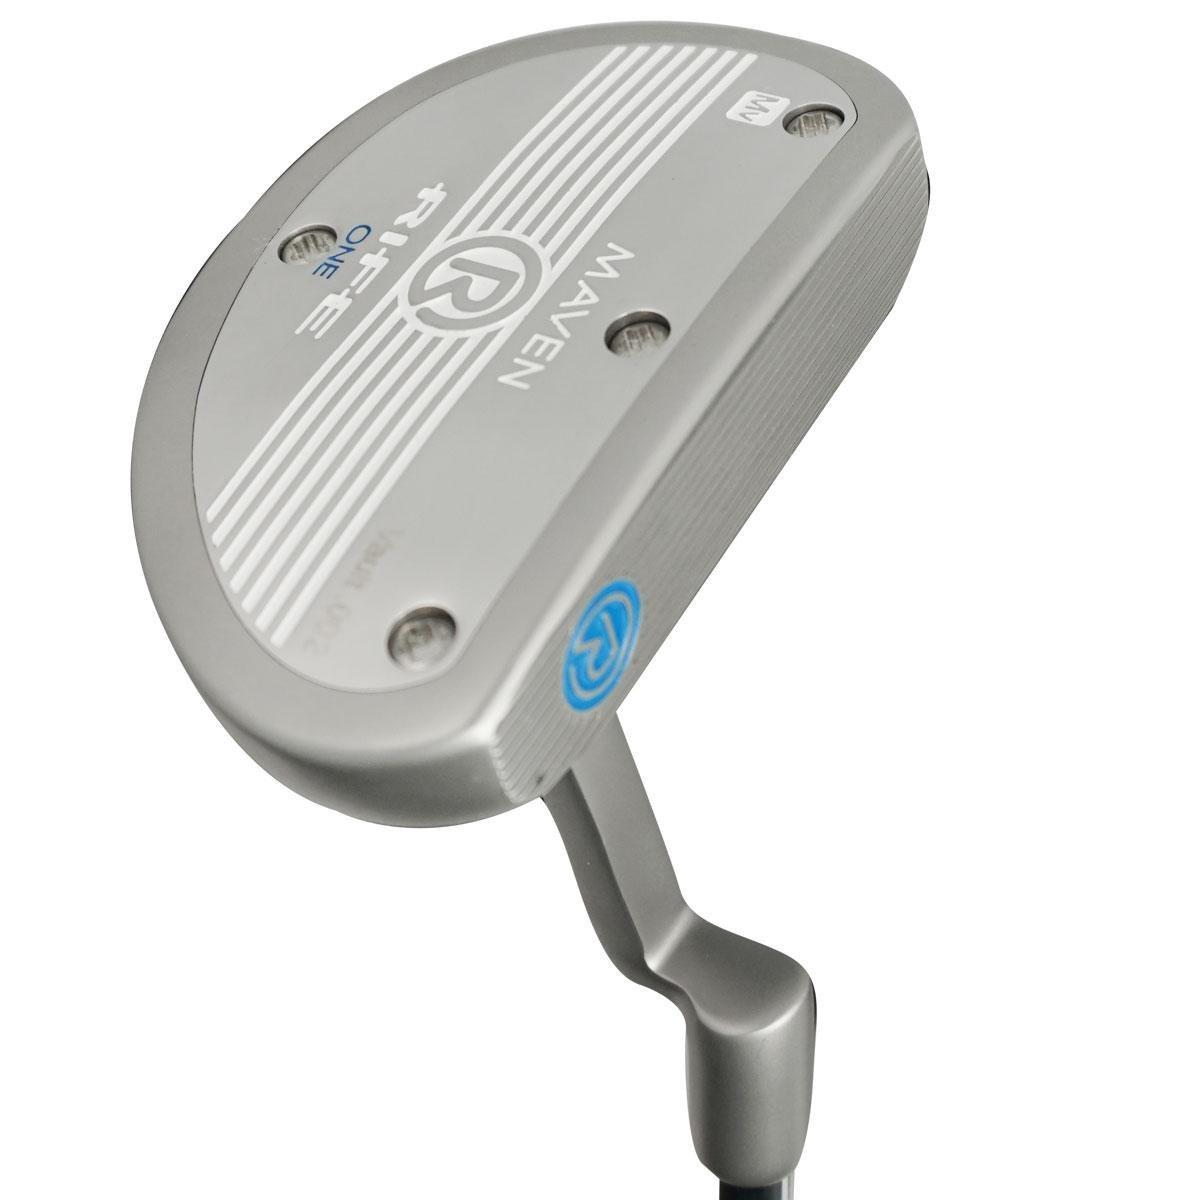 Rife golf- Mavenパター B013IHV0S2  35 インチ